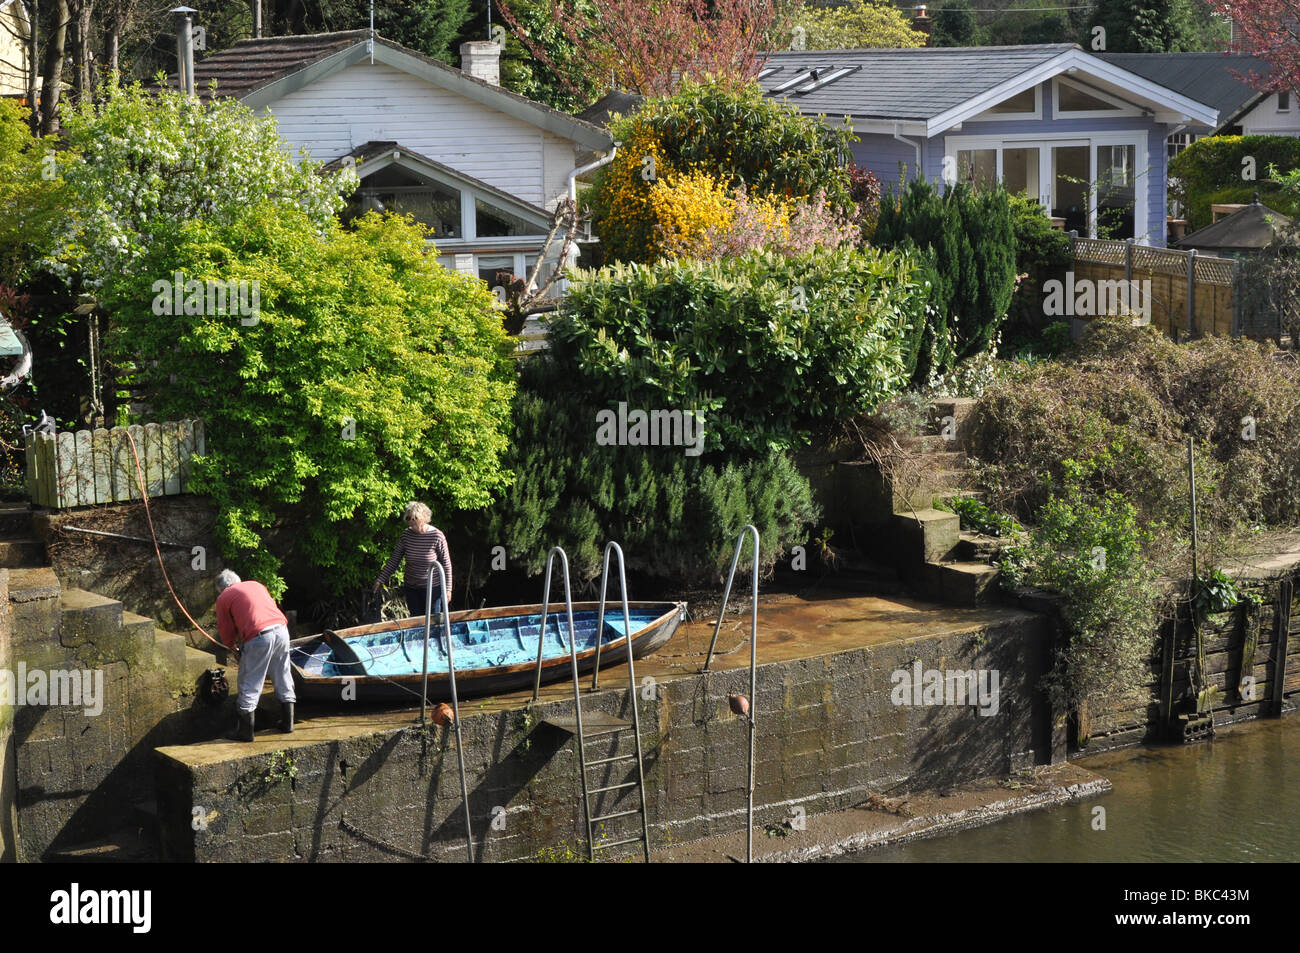 Eel Pie Islanders with boat near Twickenham London England UK - Stock Image